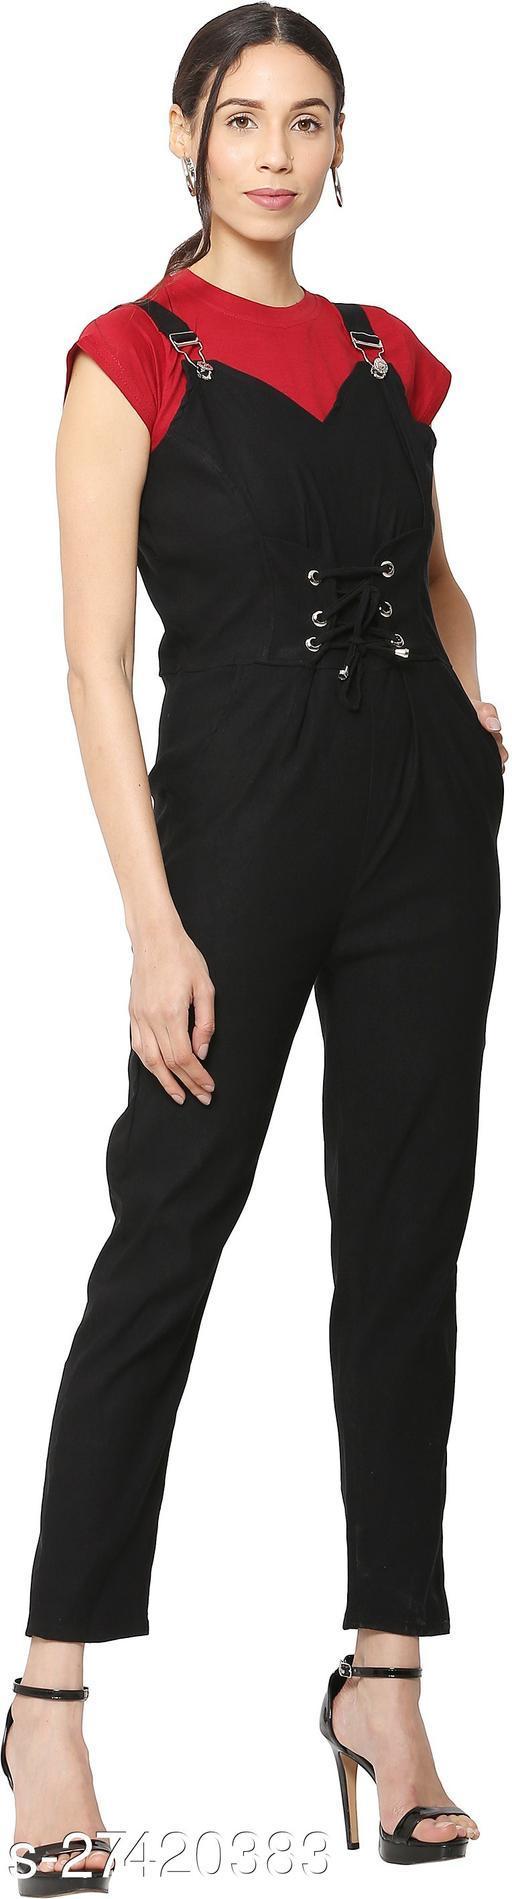 Jumpsuit Pant Black + Maroon T-Shrit